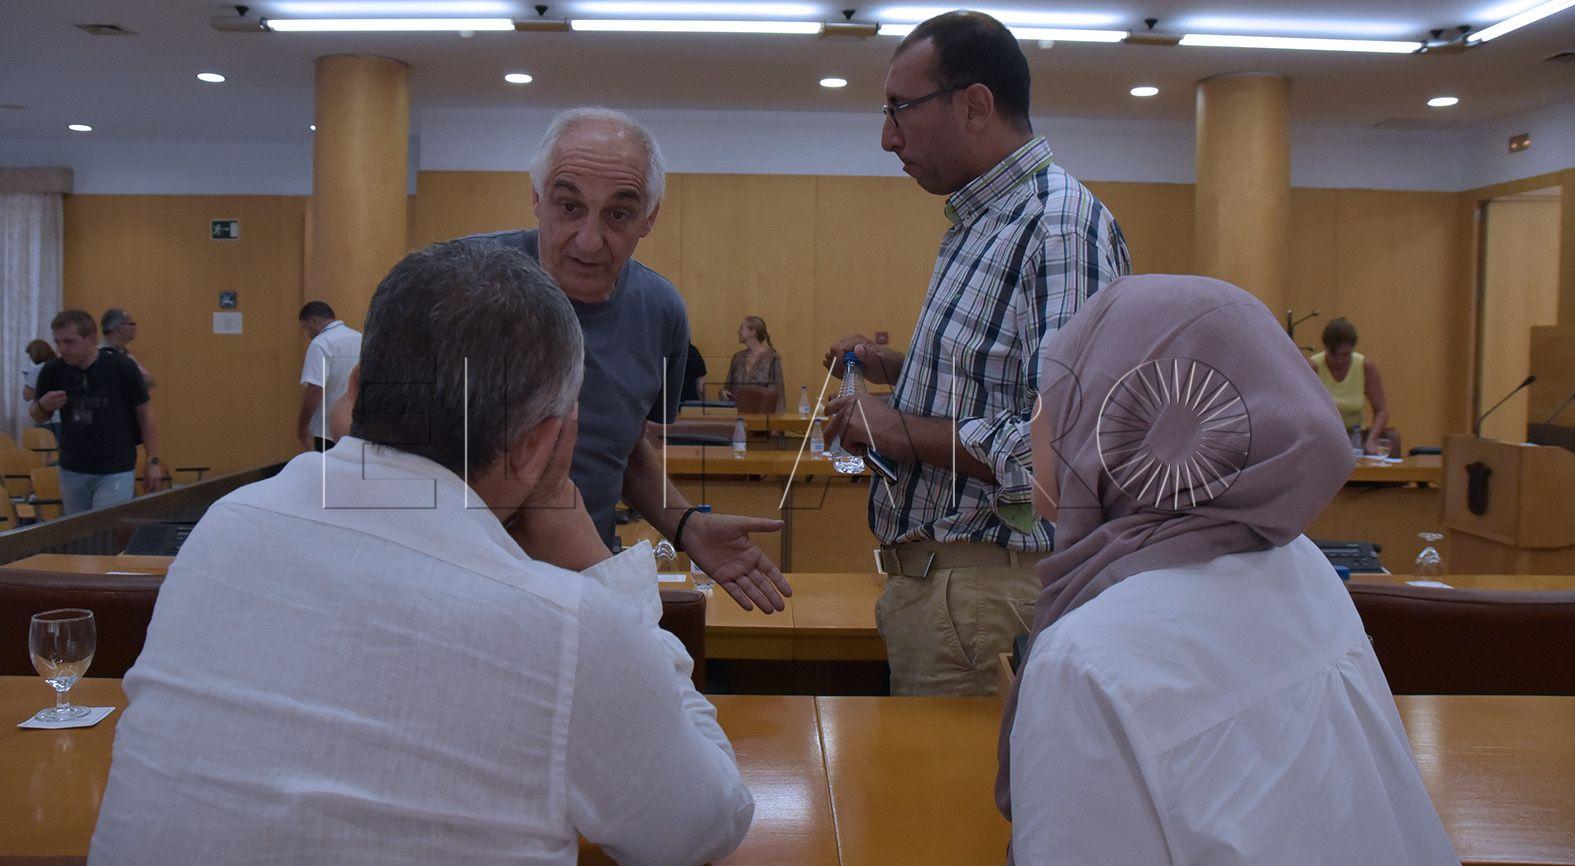 Caballas propondrá un plan de actividades lúdico-educativas en barriadas